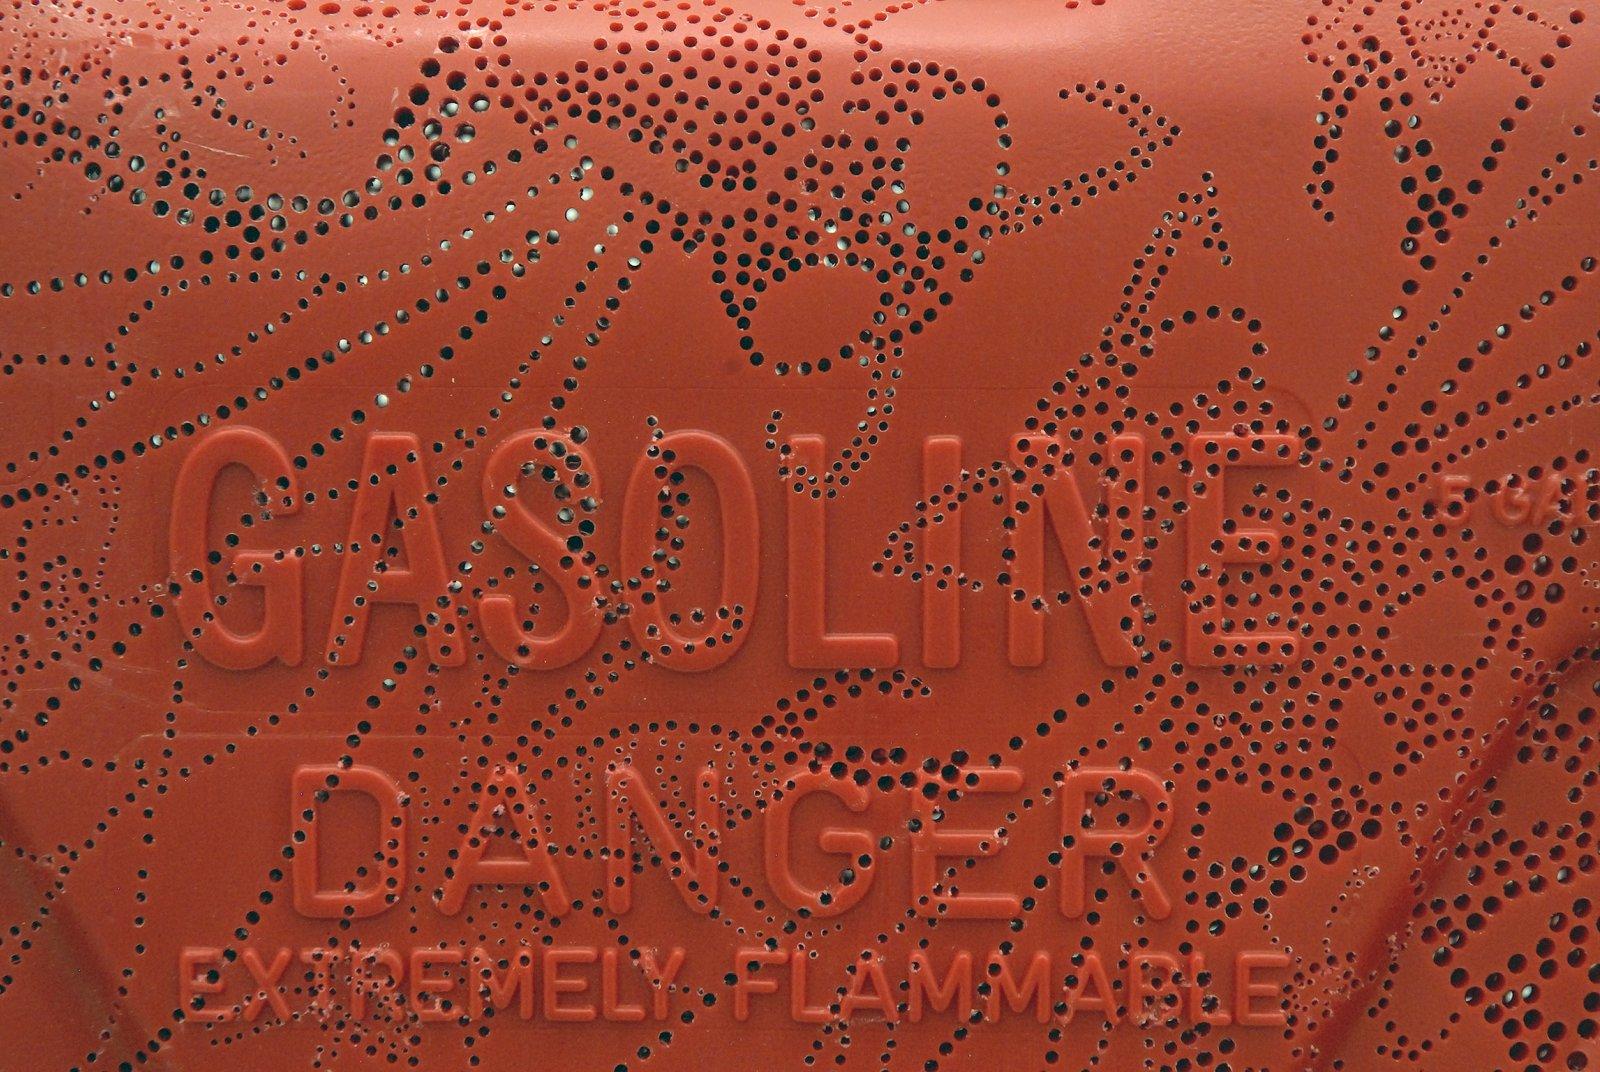 Brian Jungen,Wasp(detail), 2008, carved gallon gasoline jug, 18 x 13 x 7 in. (46 x 33 x 18 cm)